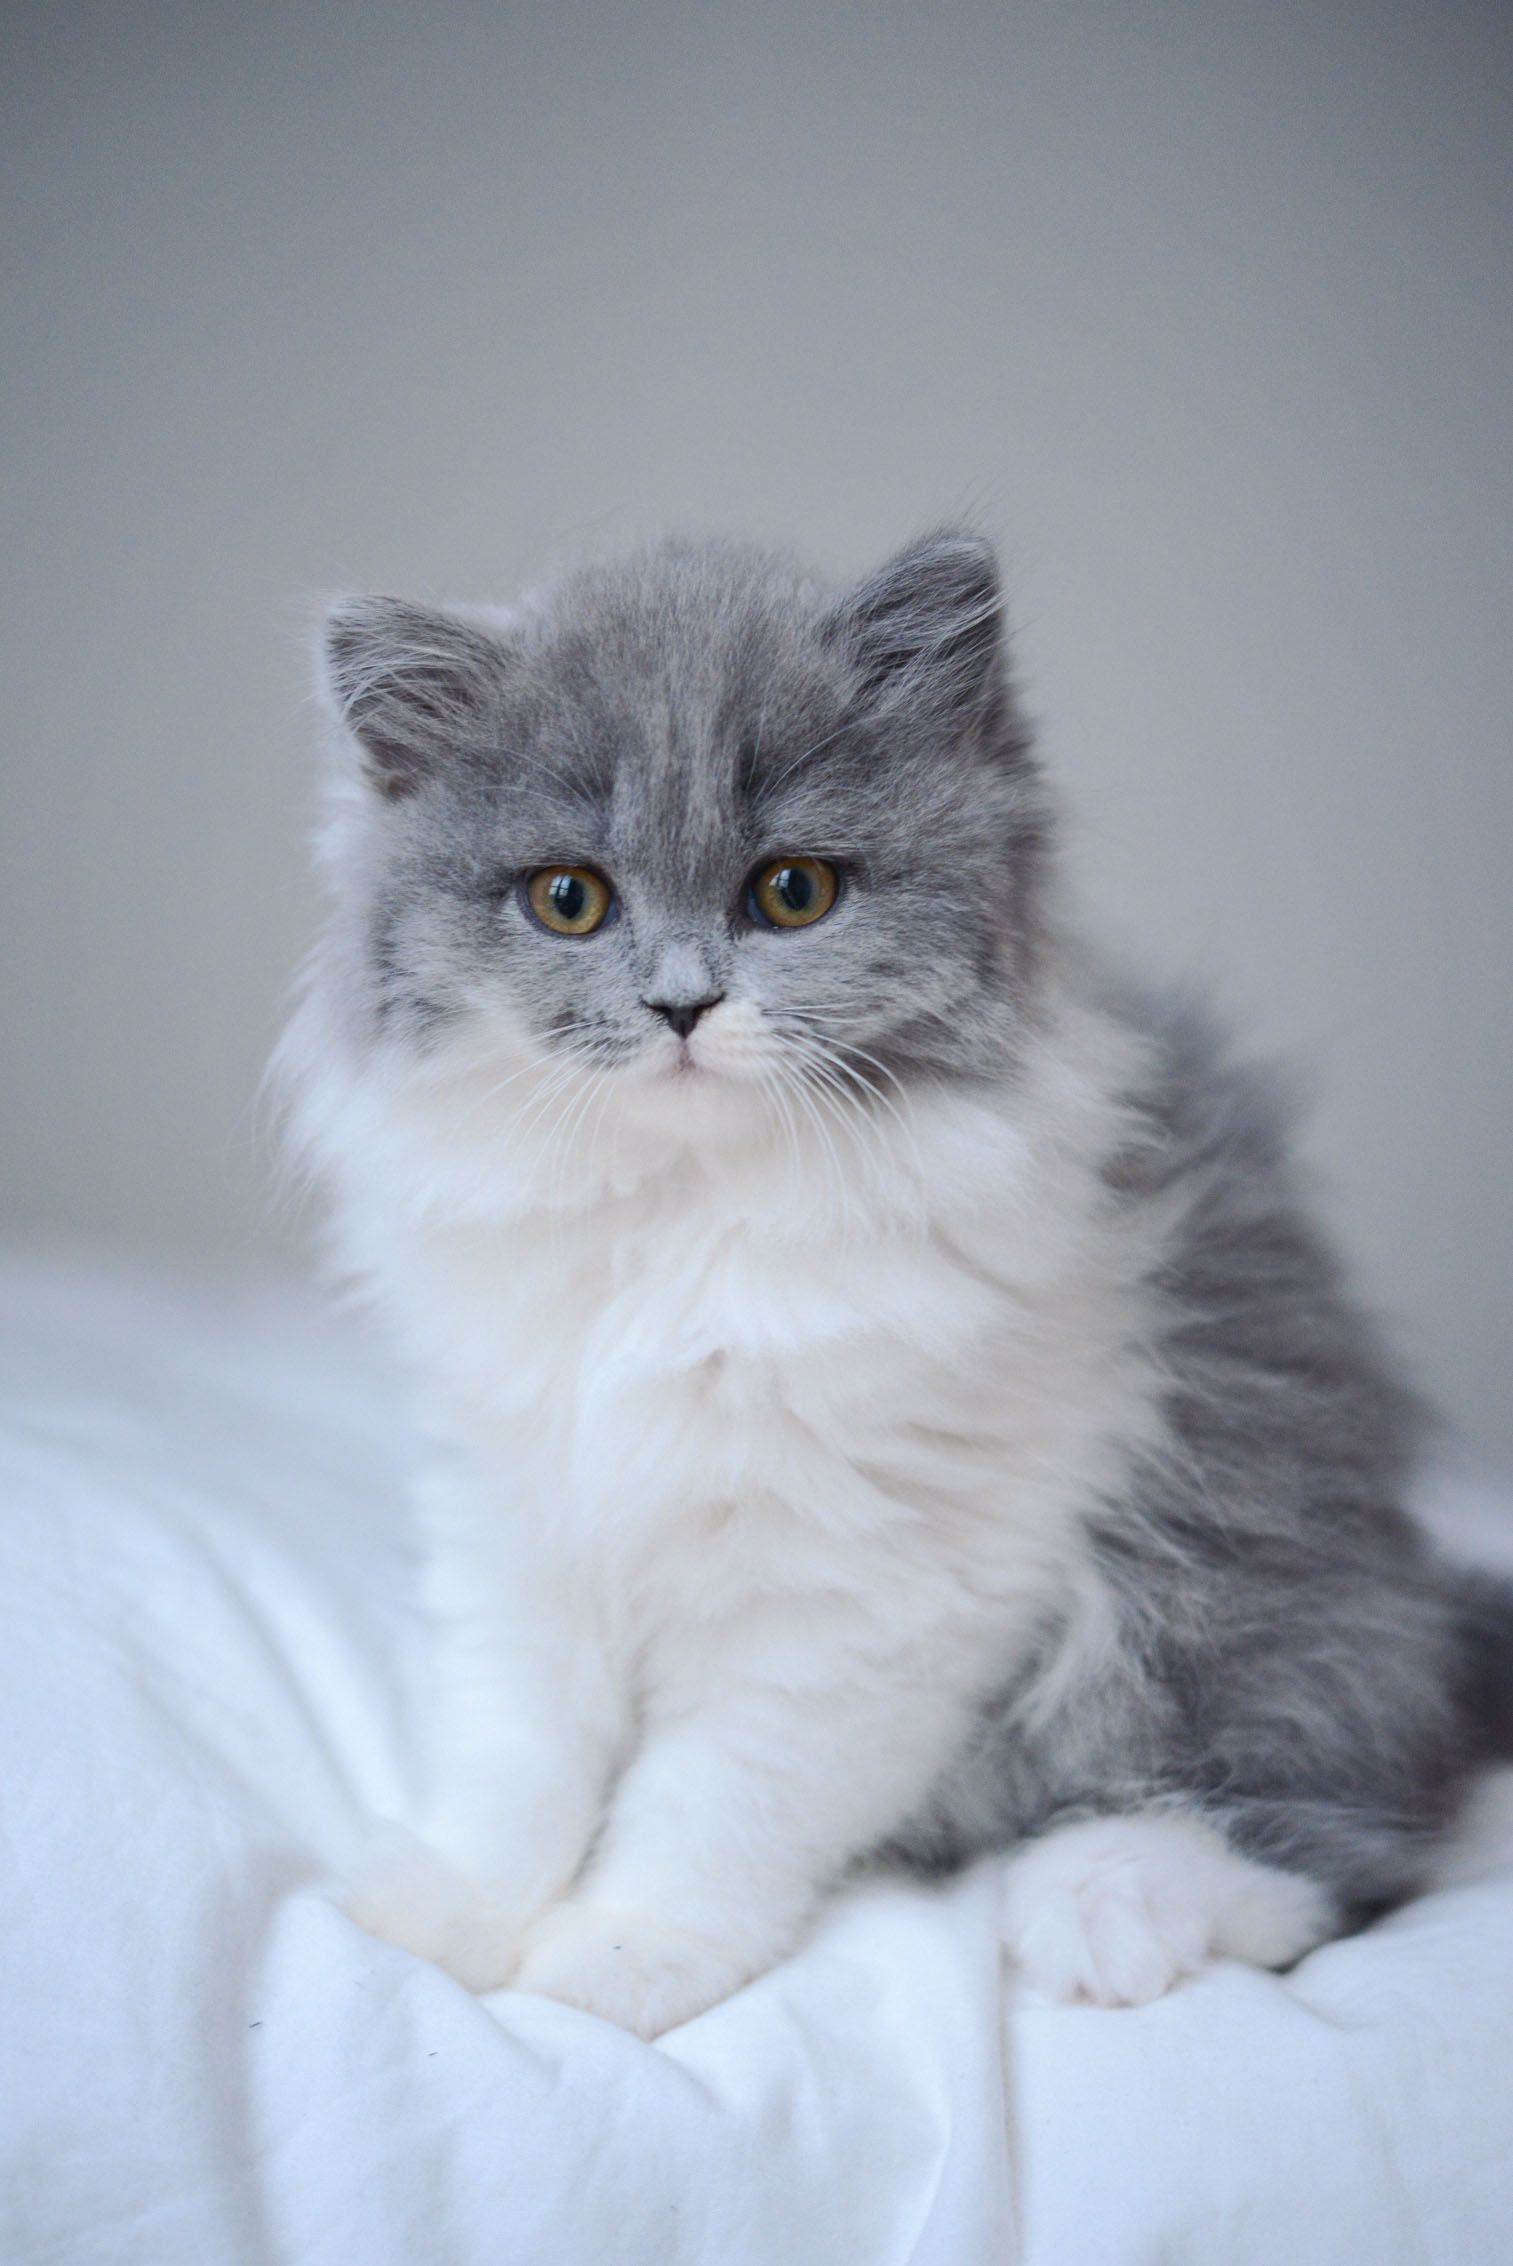 Chat Gris Bicolore Bleu Et Blanc Chaton British Longhair Des British Du Clos D Eugenie Elevage De British S Grey And White Kitten Kittens Cutest Pretty Cats